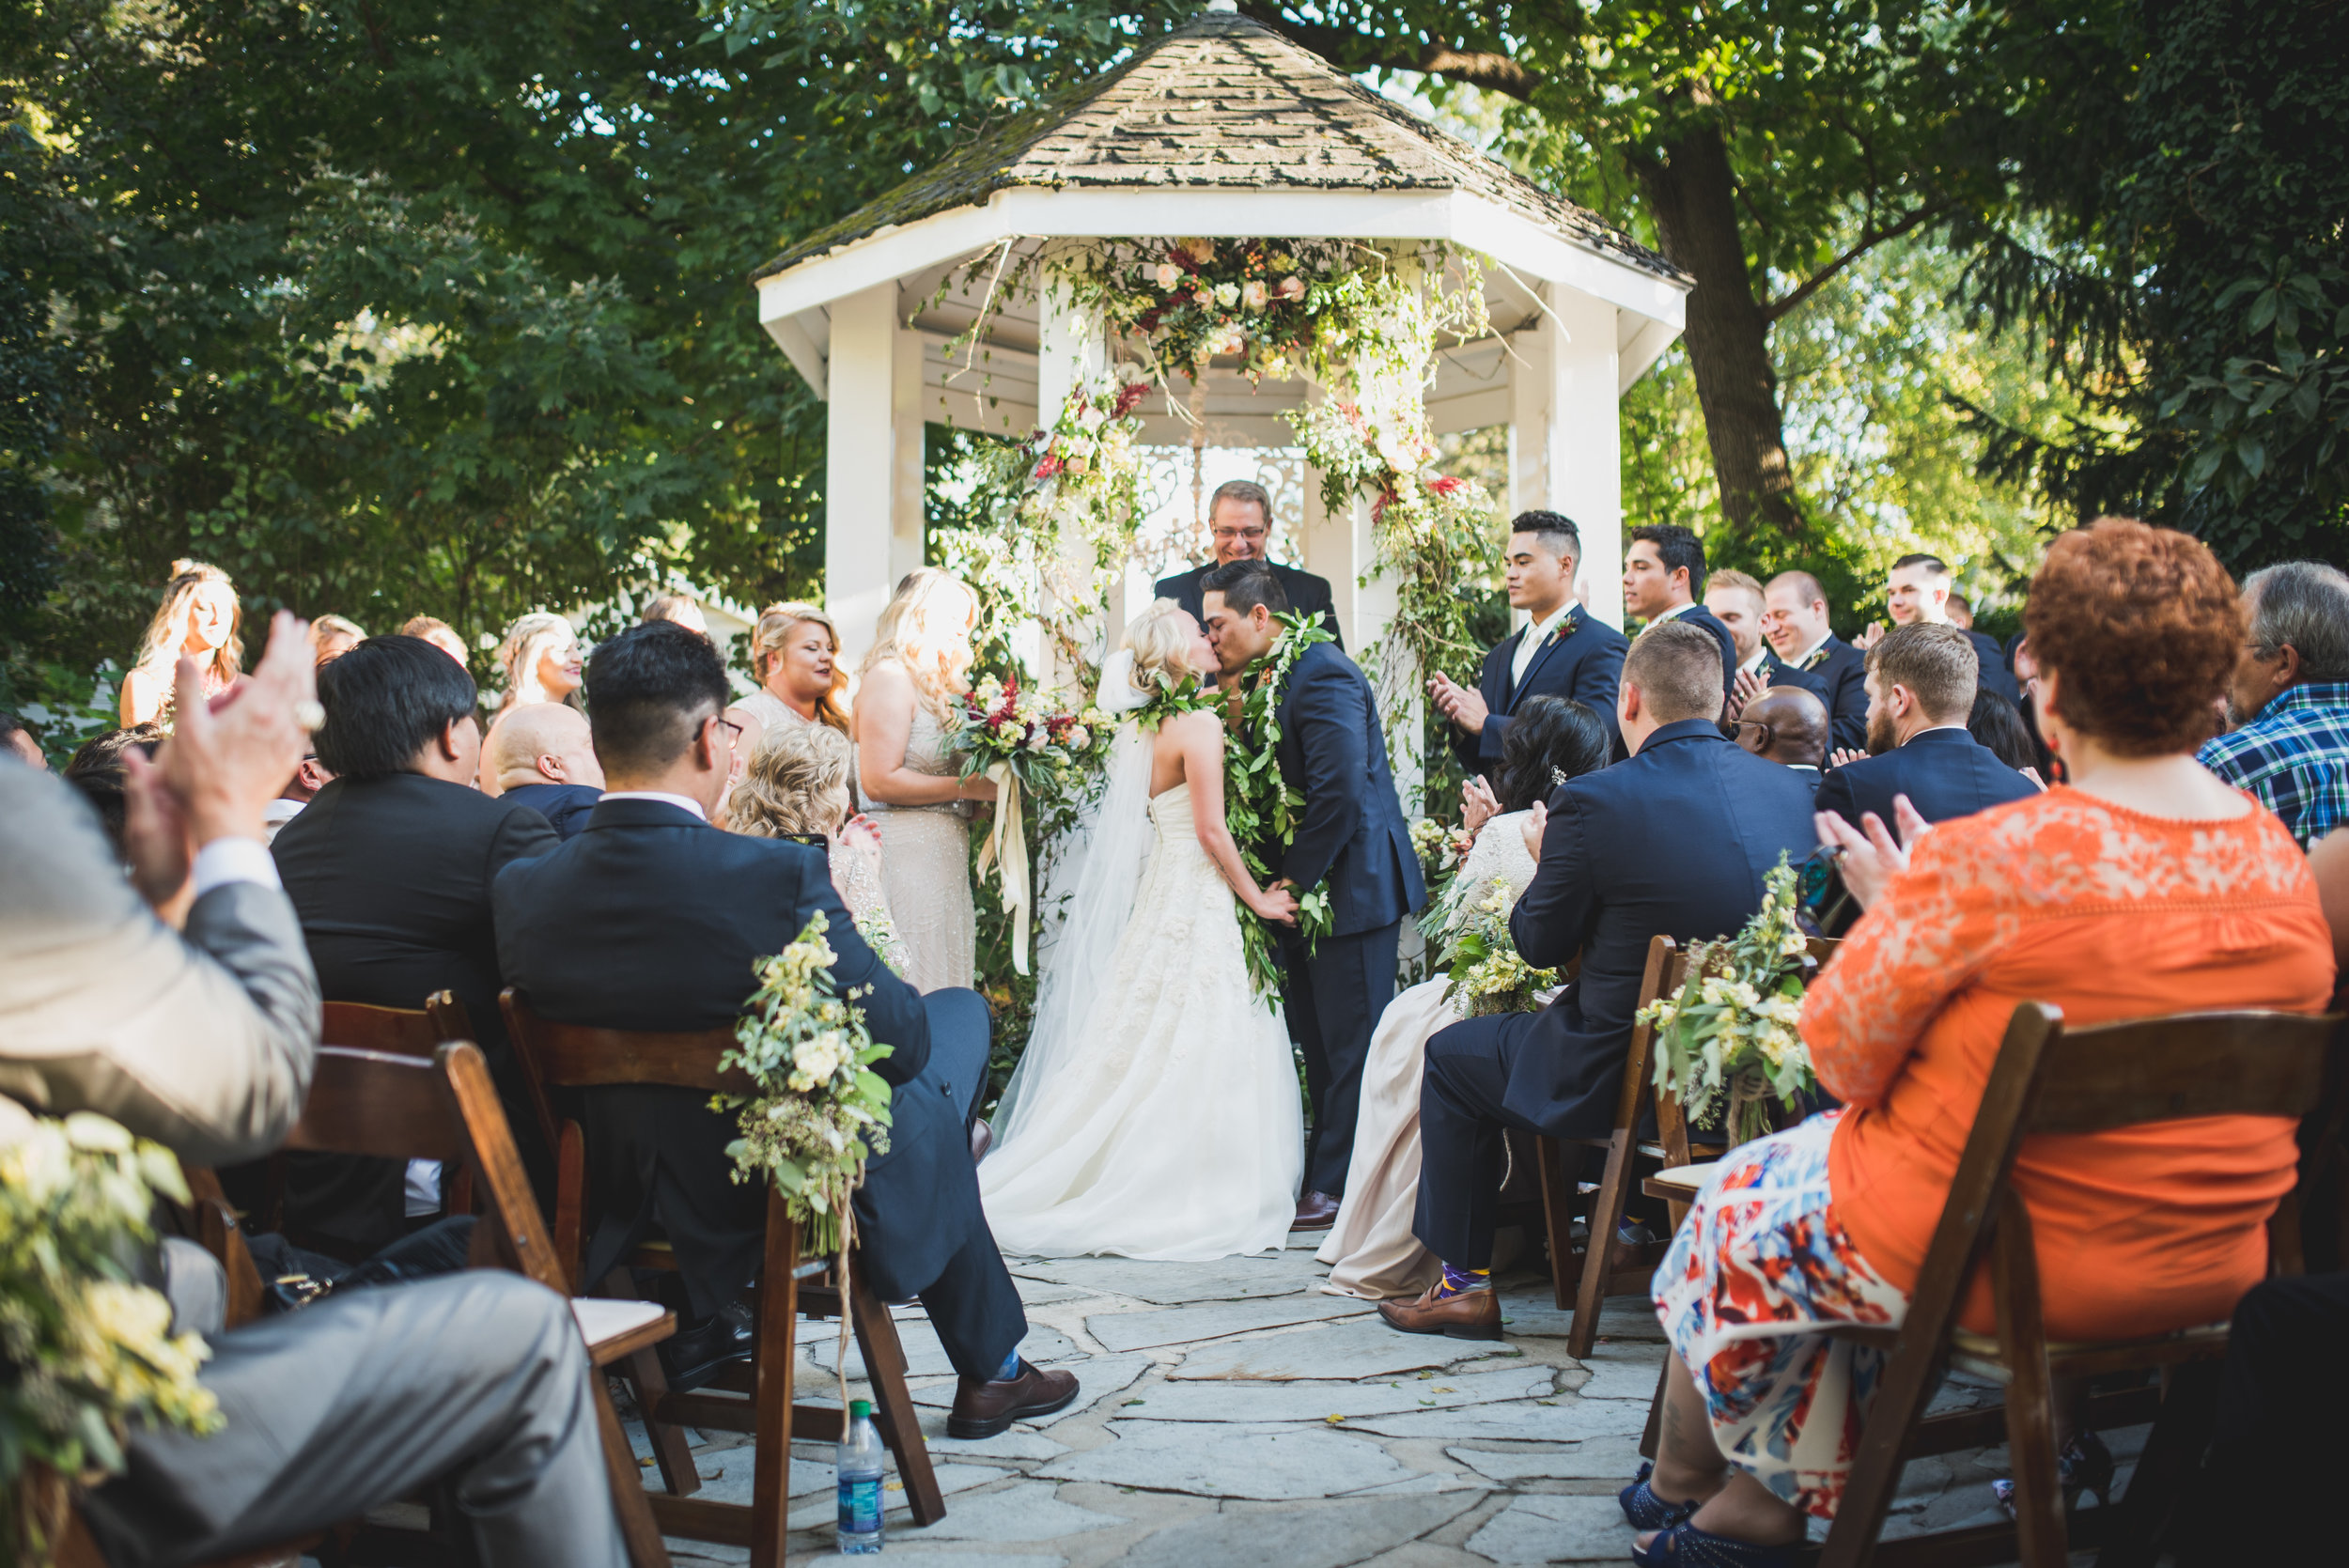 Nashville-wedding-photographers-CJ's-Off-The-Square-35.JPG